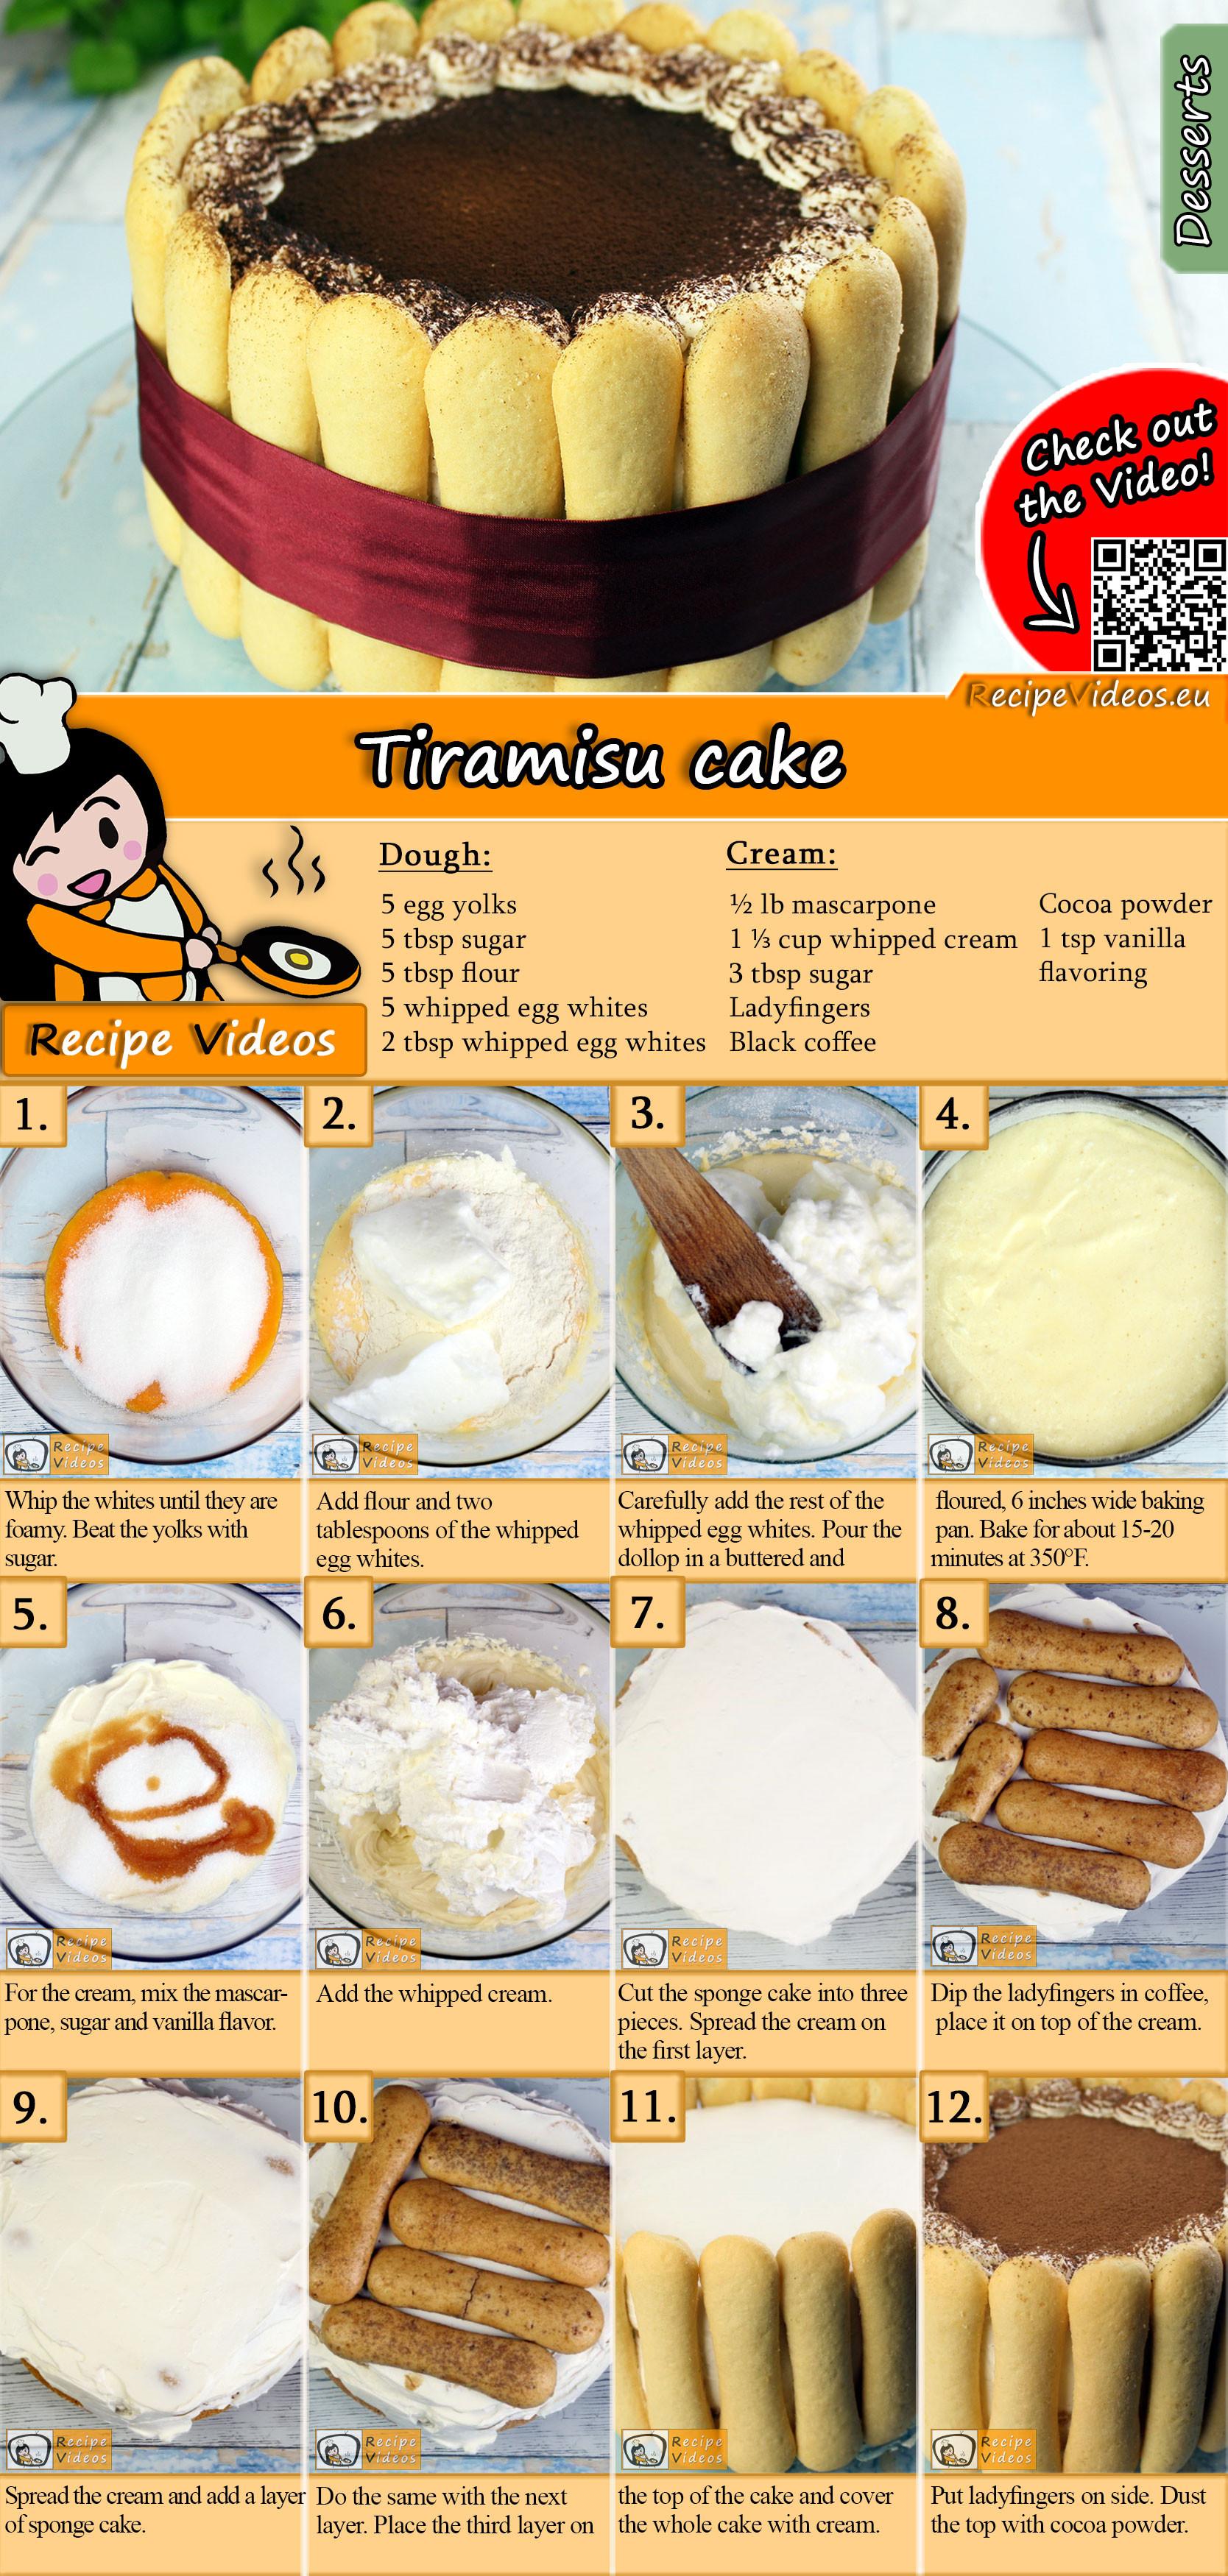 Tiramisu cake recipe with video